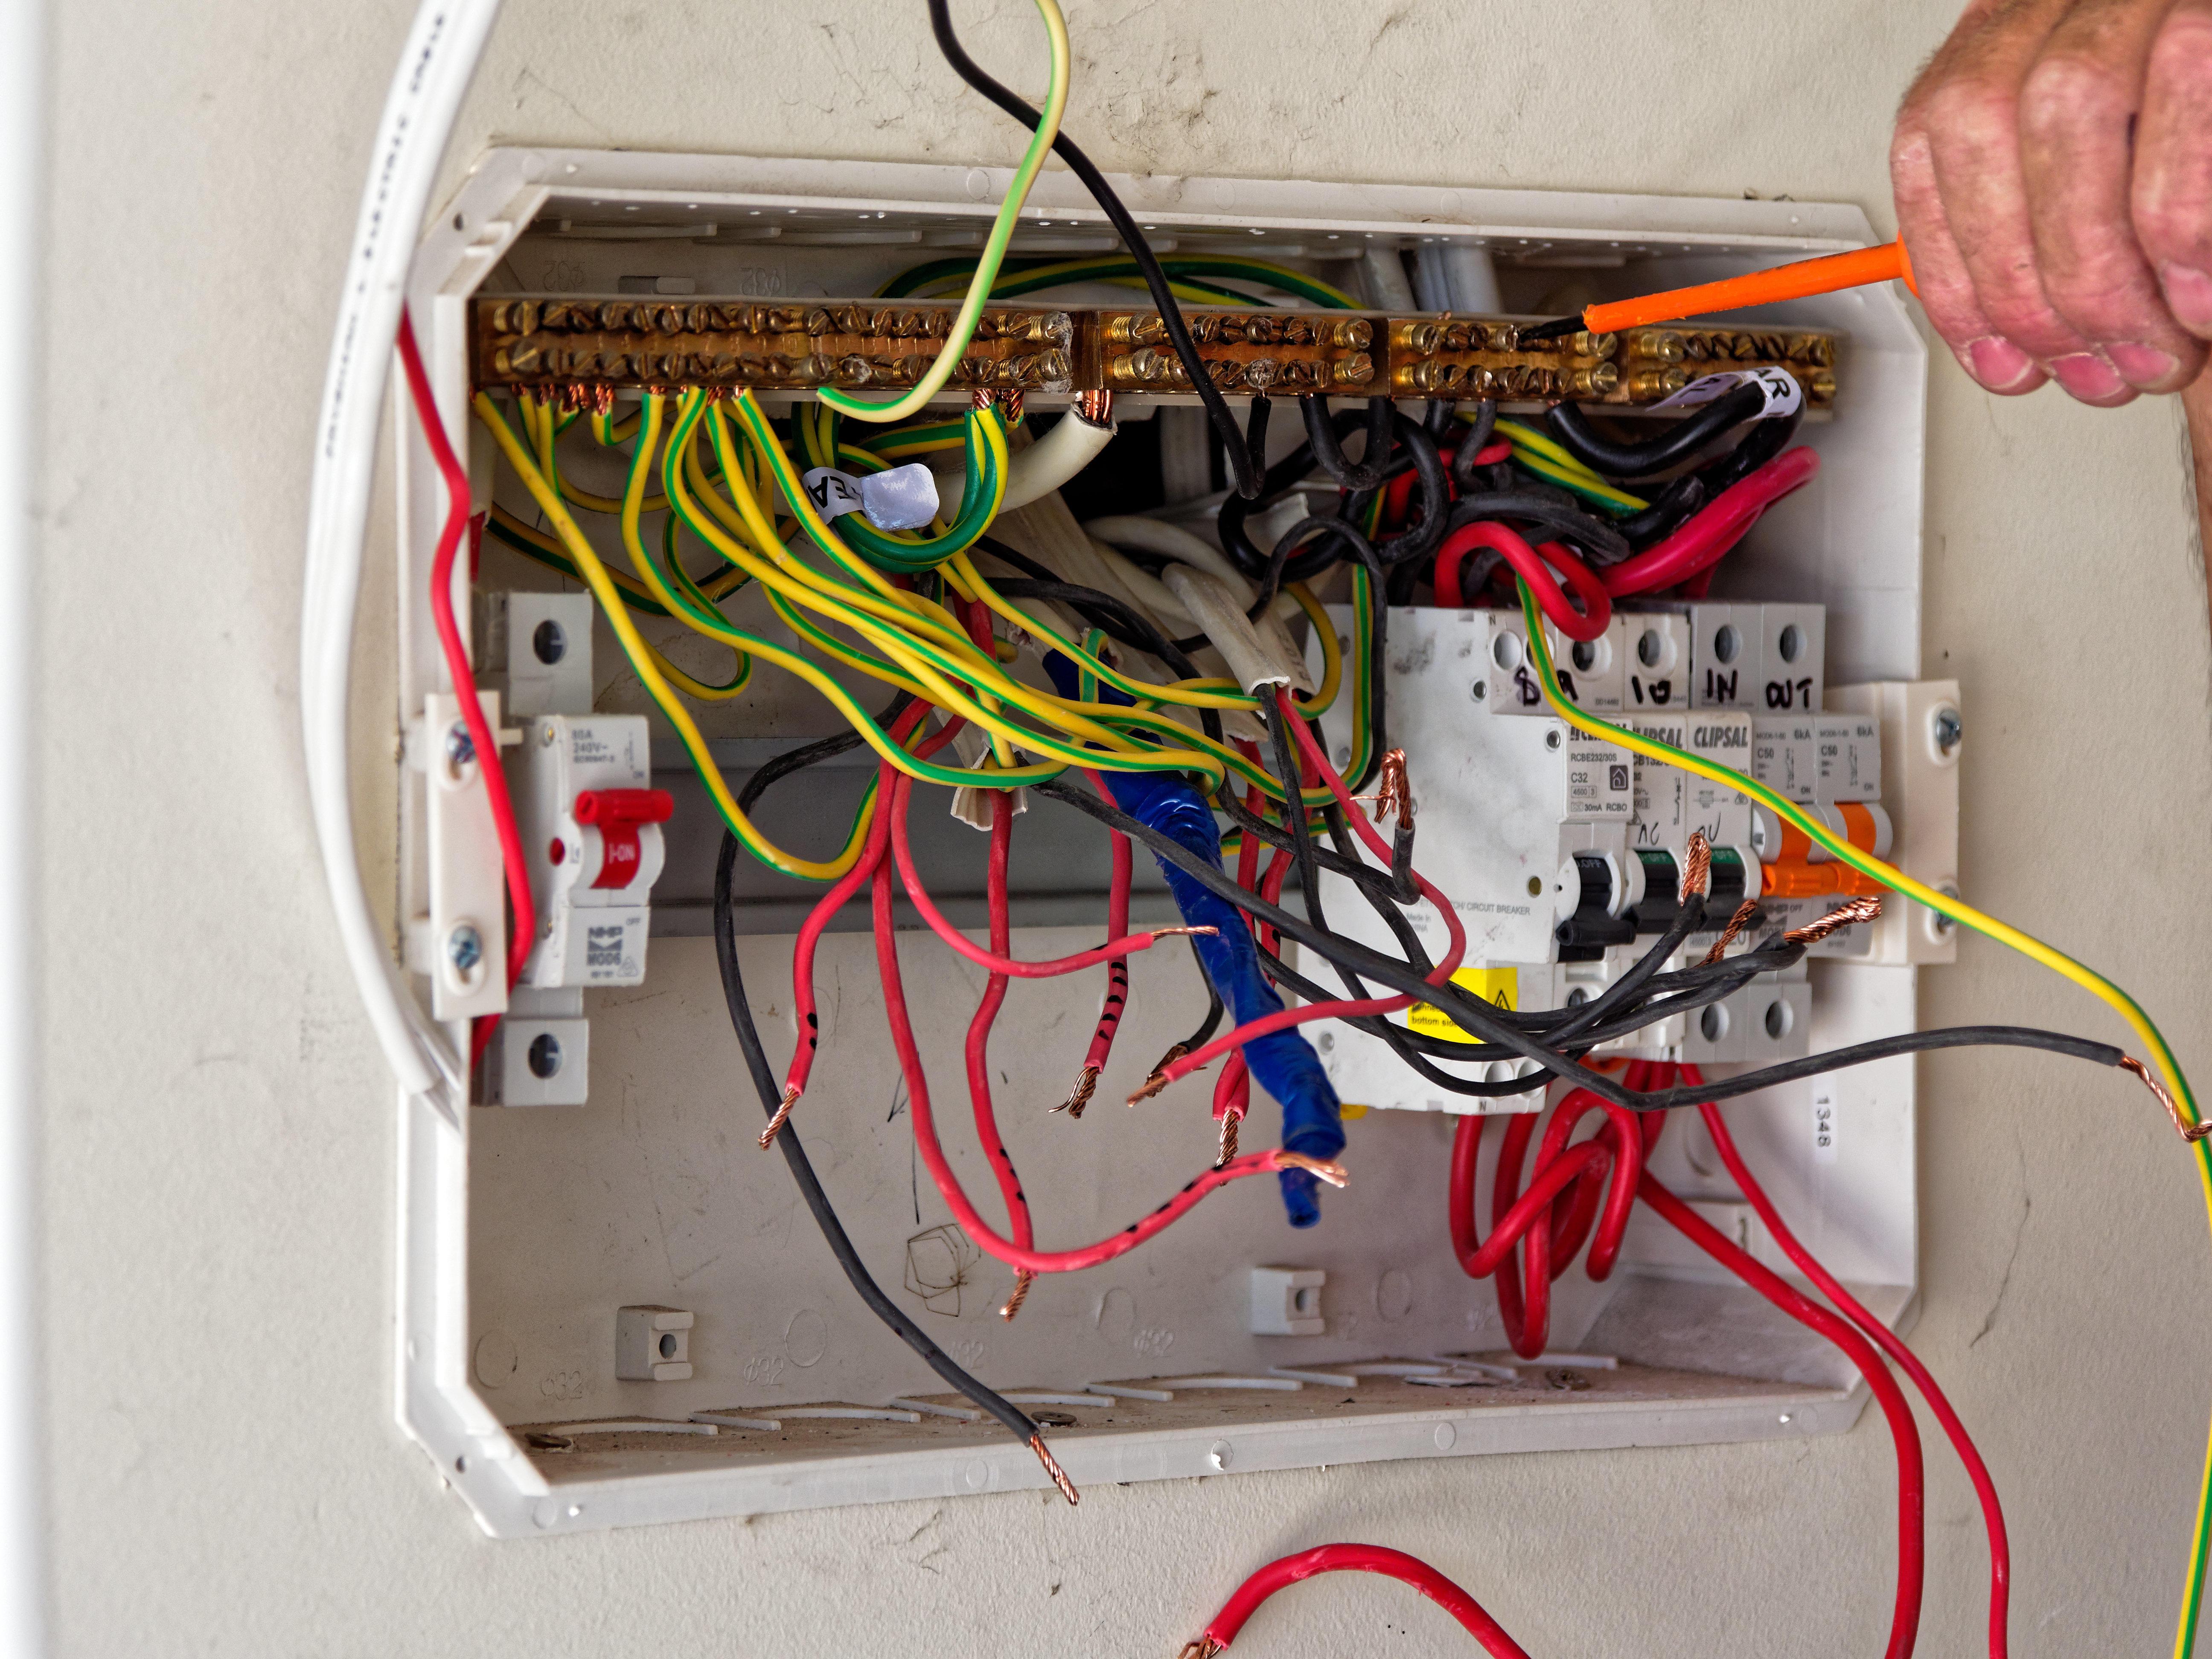 Rewiring-11.jpeg